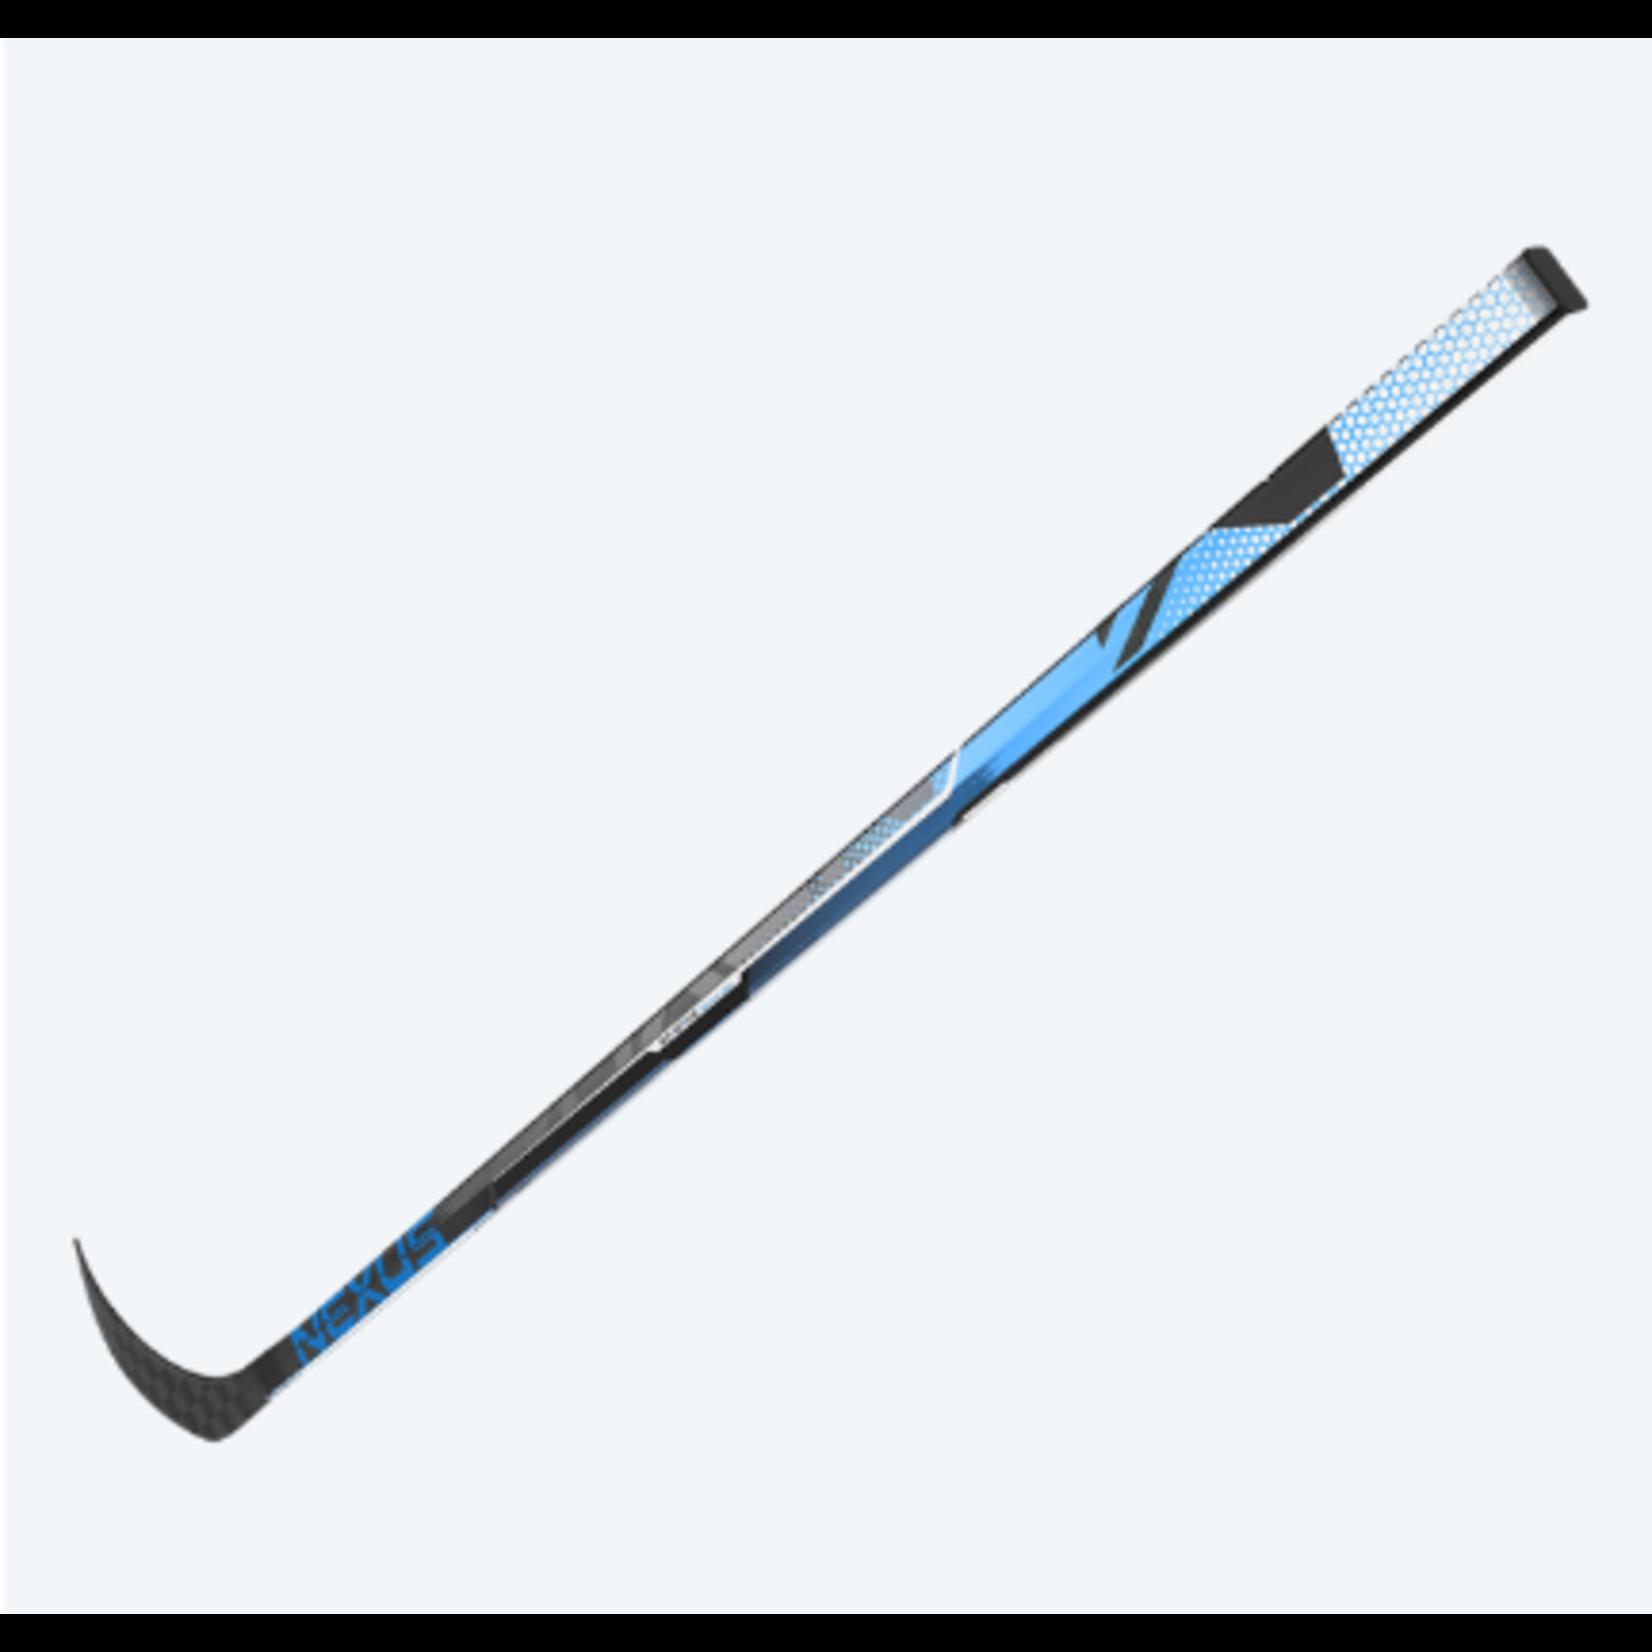 S21 Nexus 3N Pro Grip Stick Int - 55